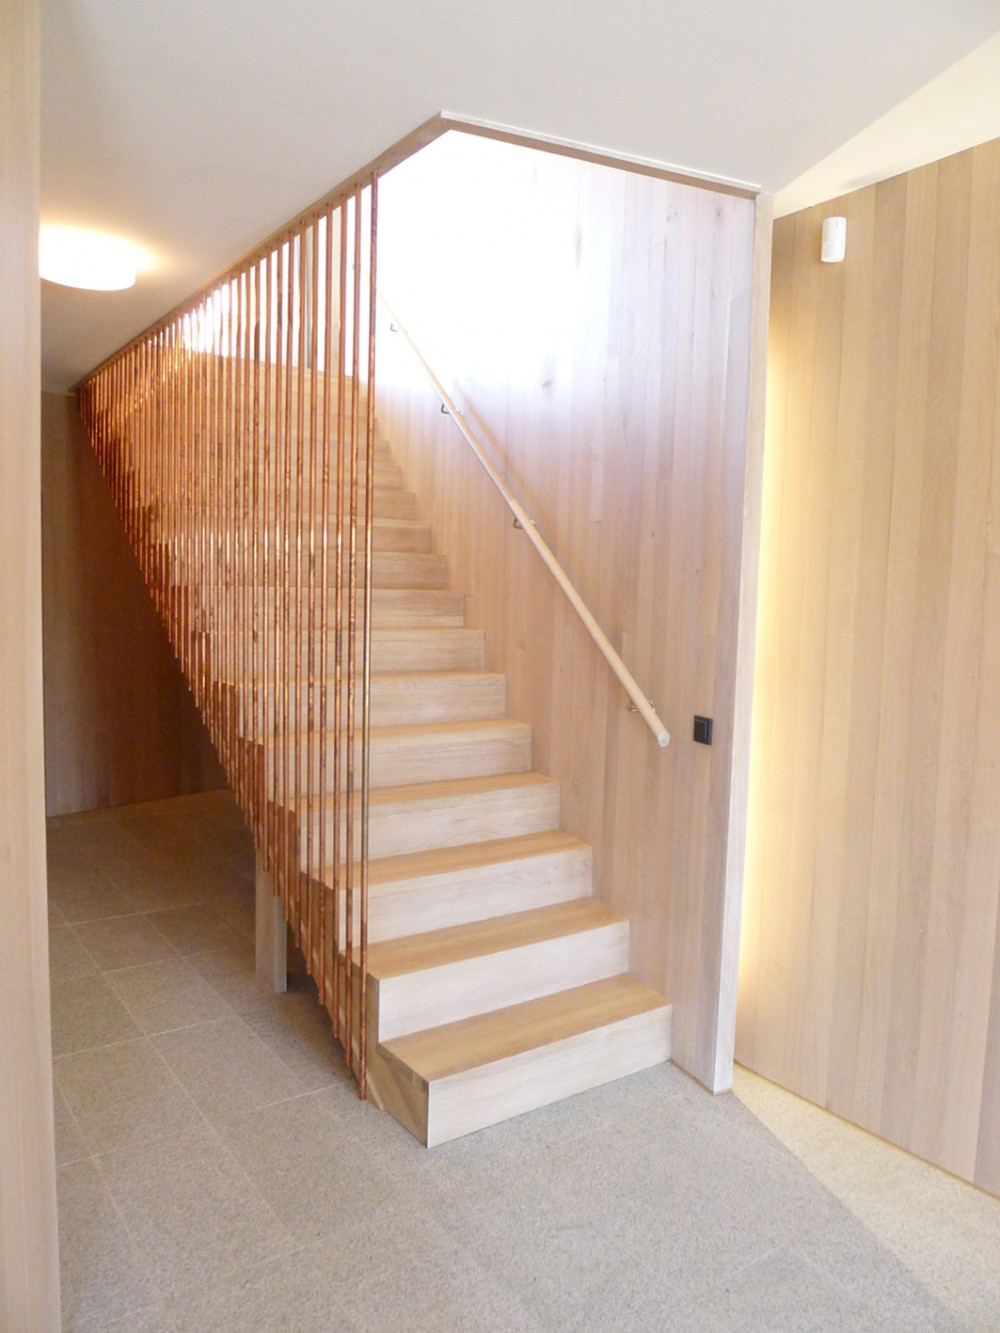 533b8714c07a804fdc00008c_casa-dividida-jva_splithouse_interior_staircase_bottom-1000x1333